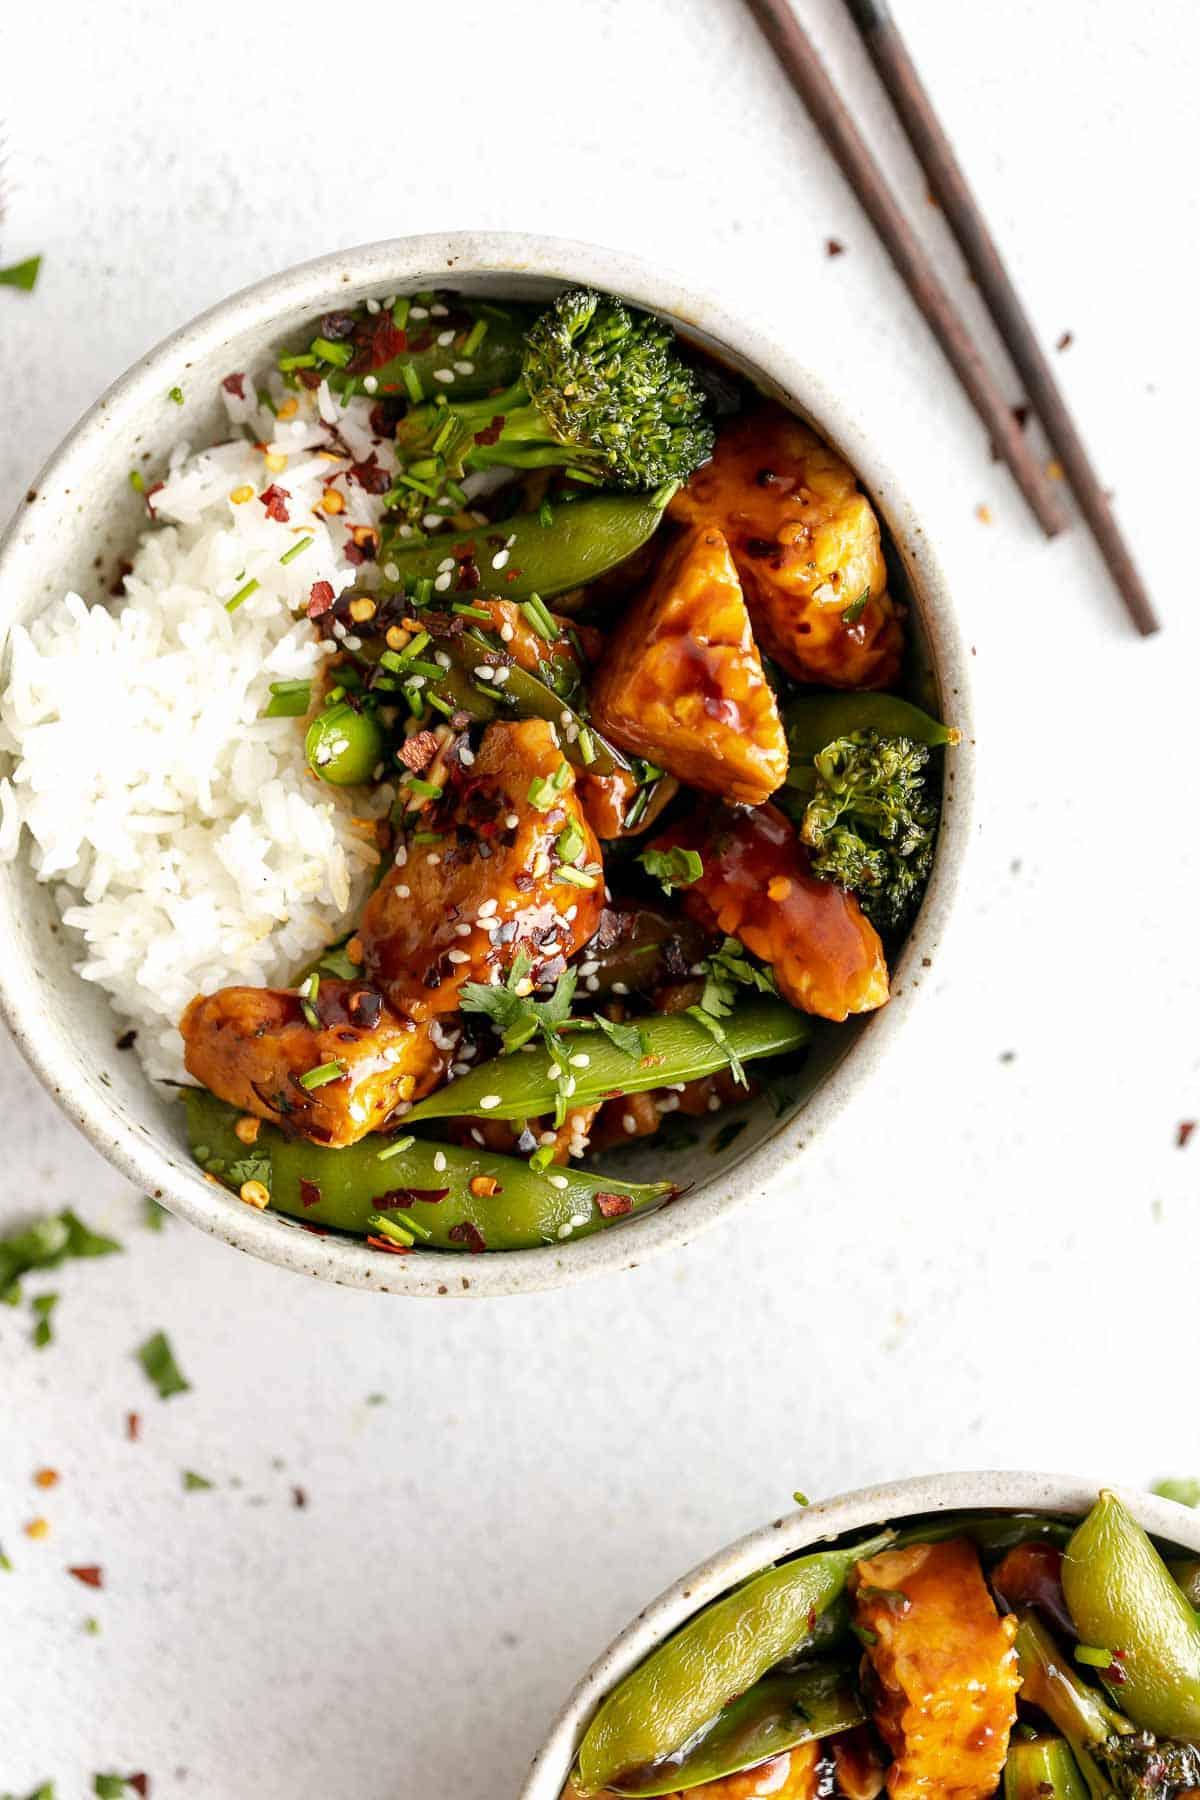 teriyaki tempeh with broccoli, snap peas and white rice